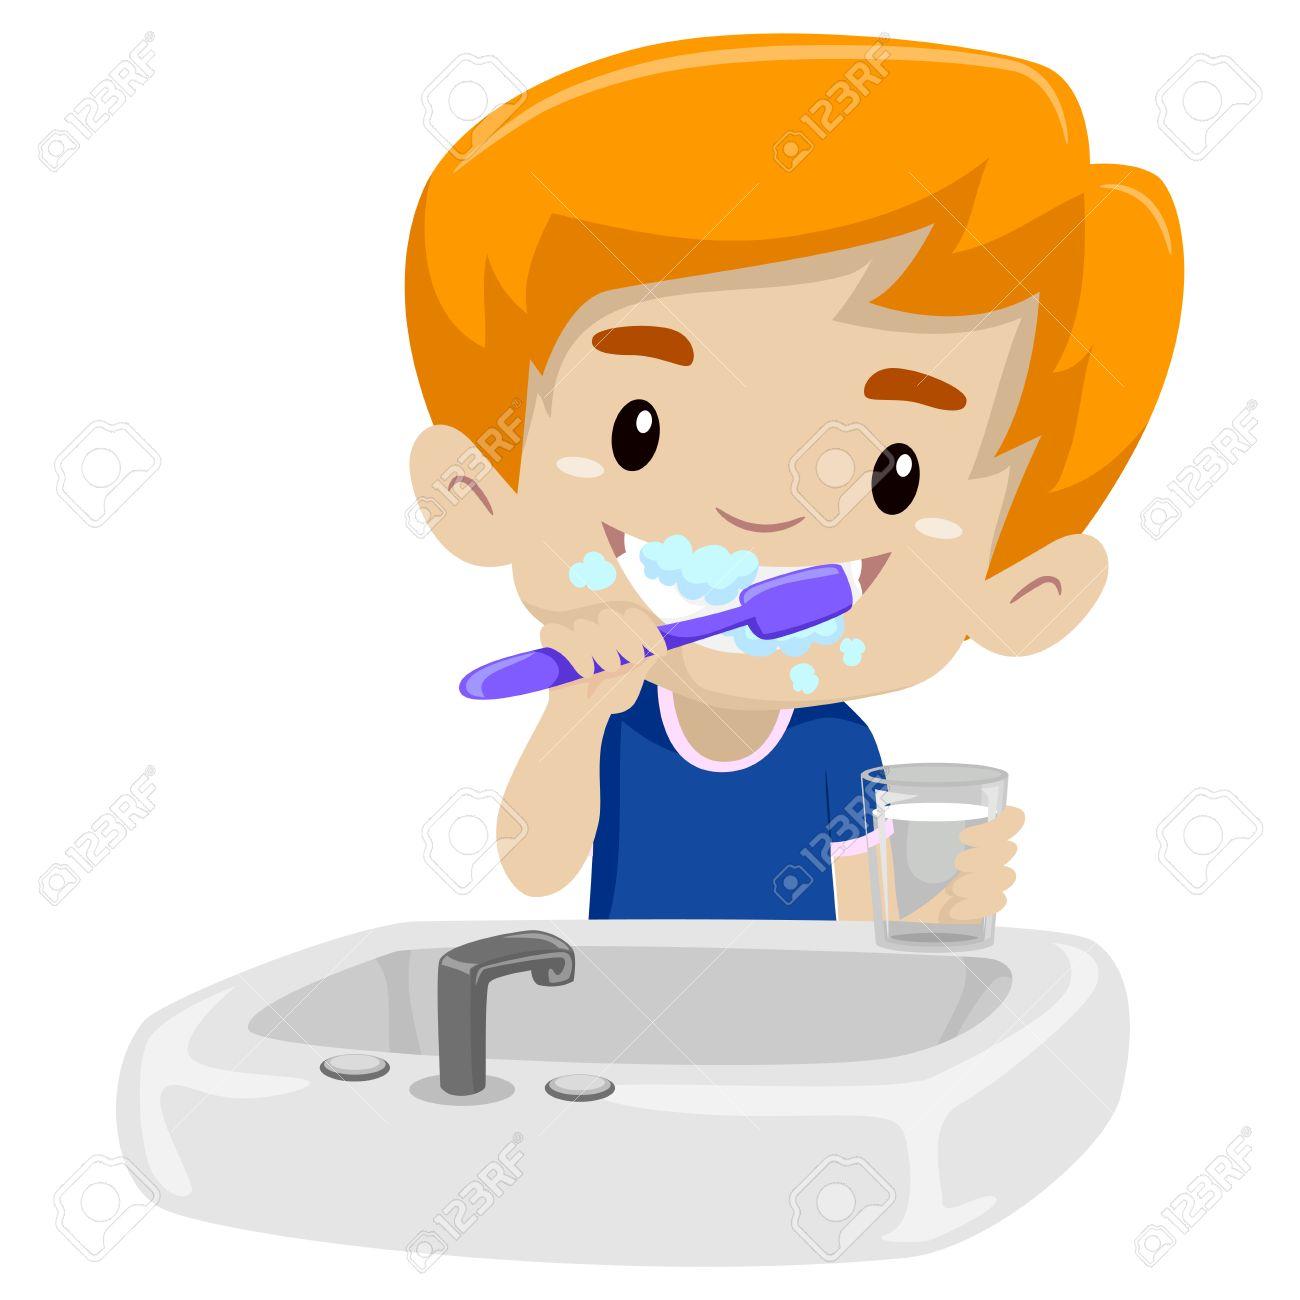 Vector Illustration of Kid Boy Brushing her teeth.